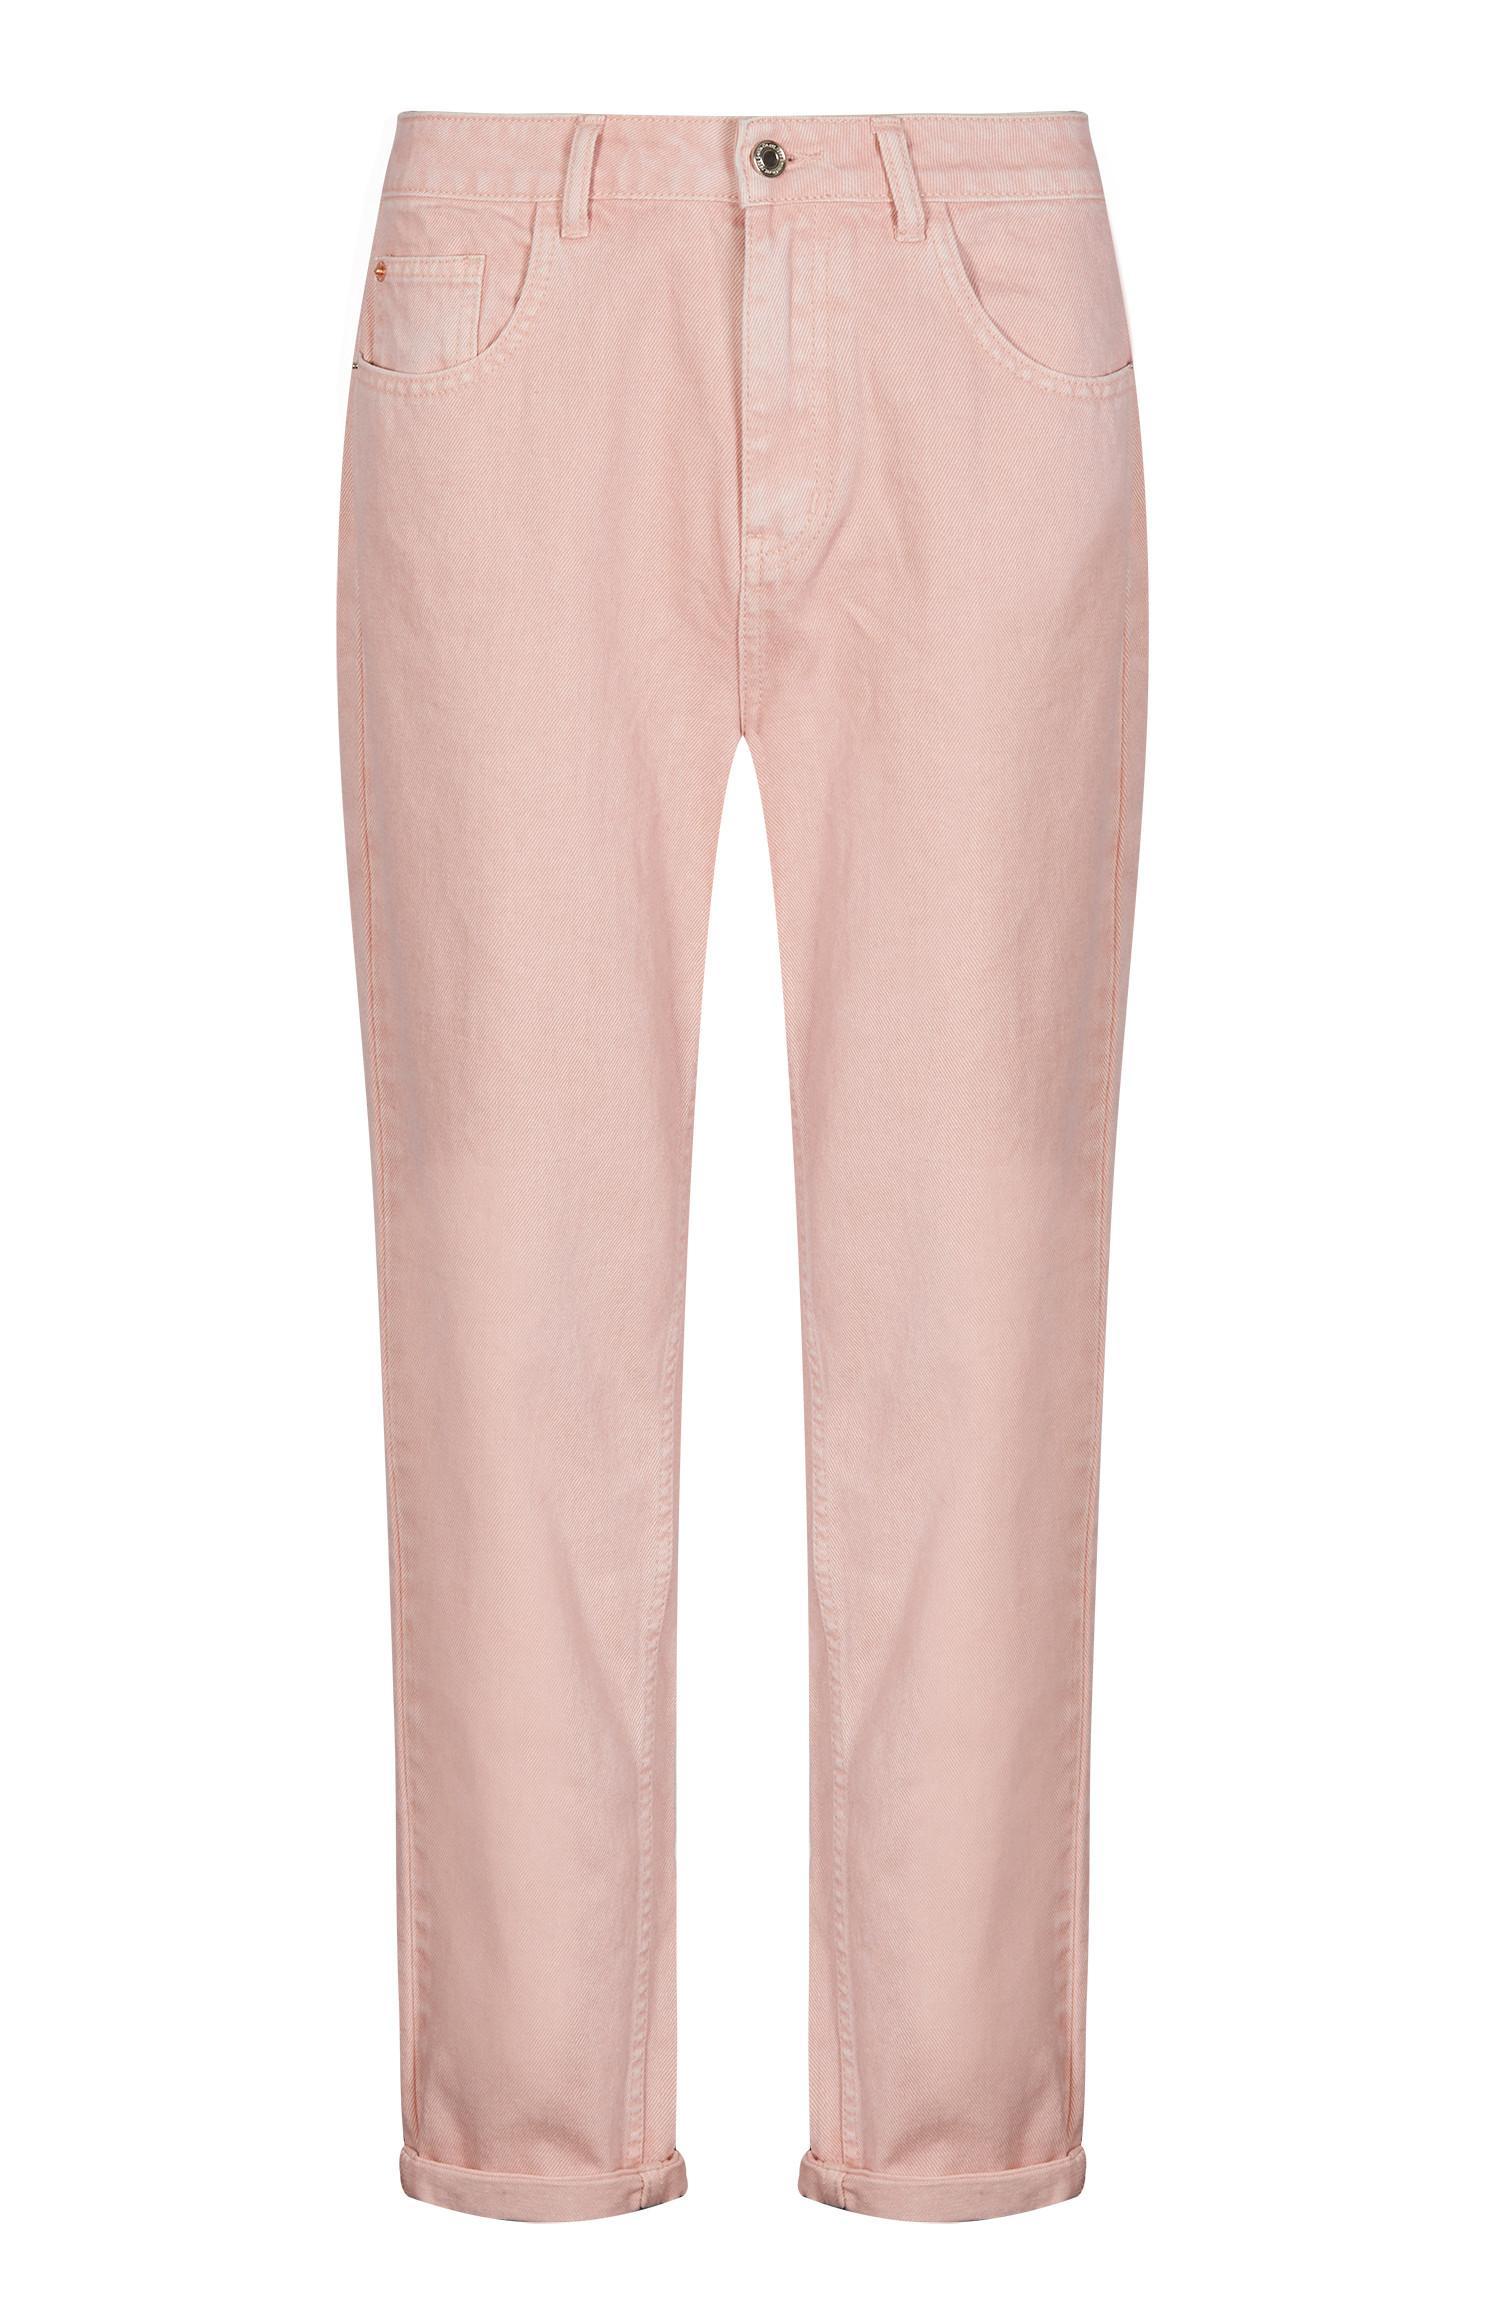 Pink Mom Jean